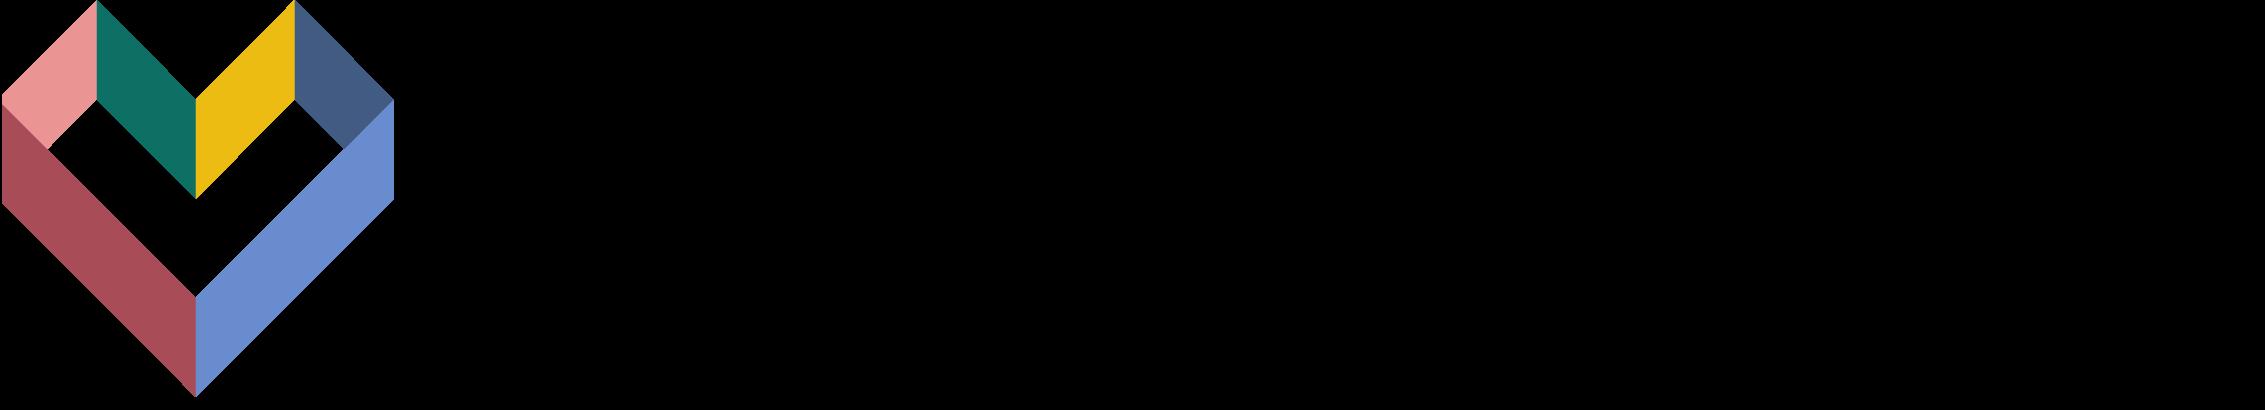 Modsy logo